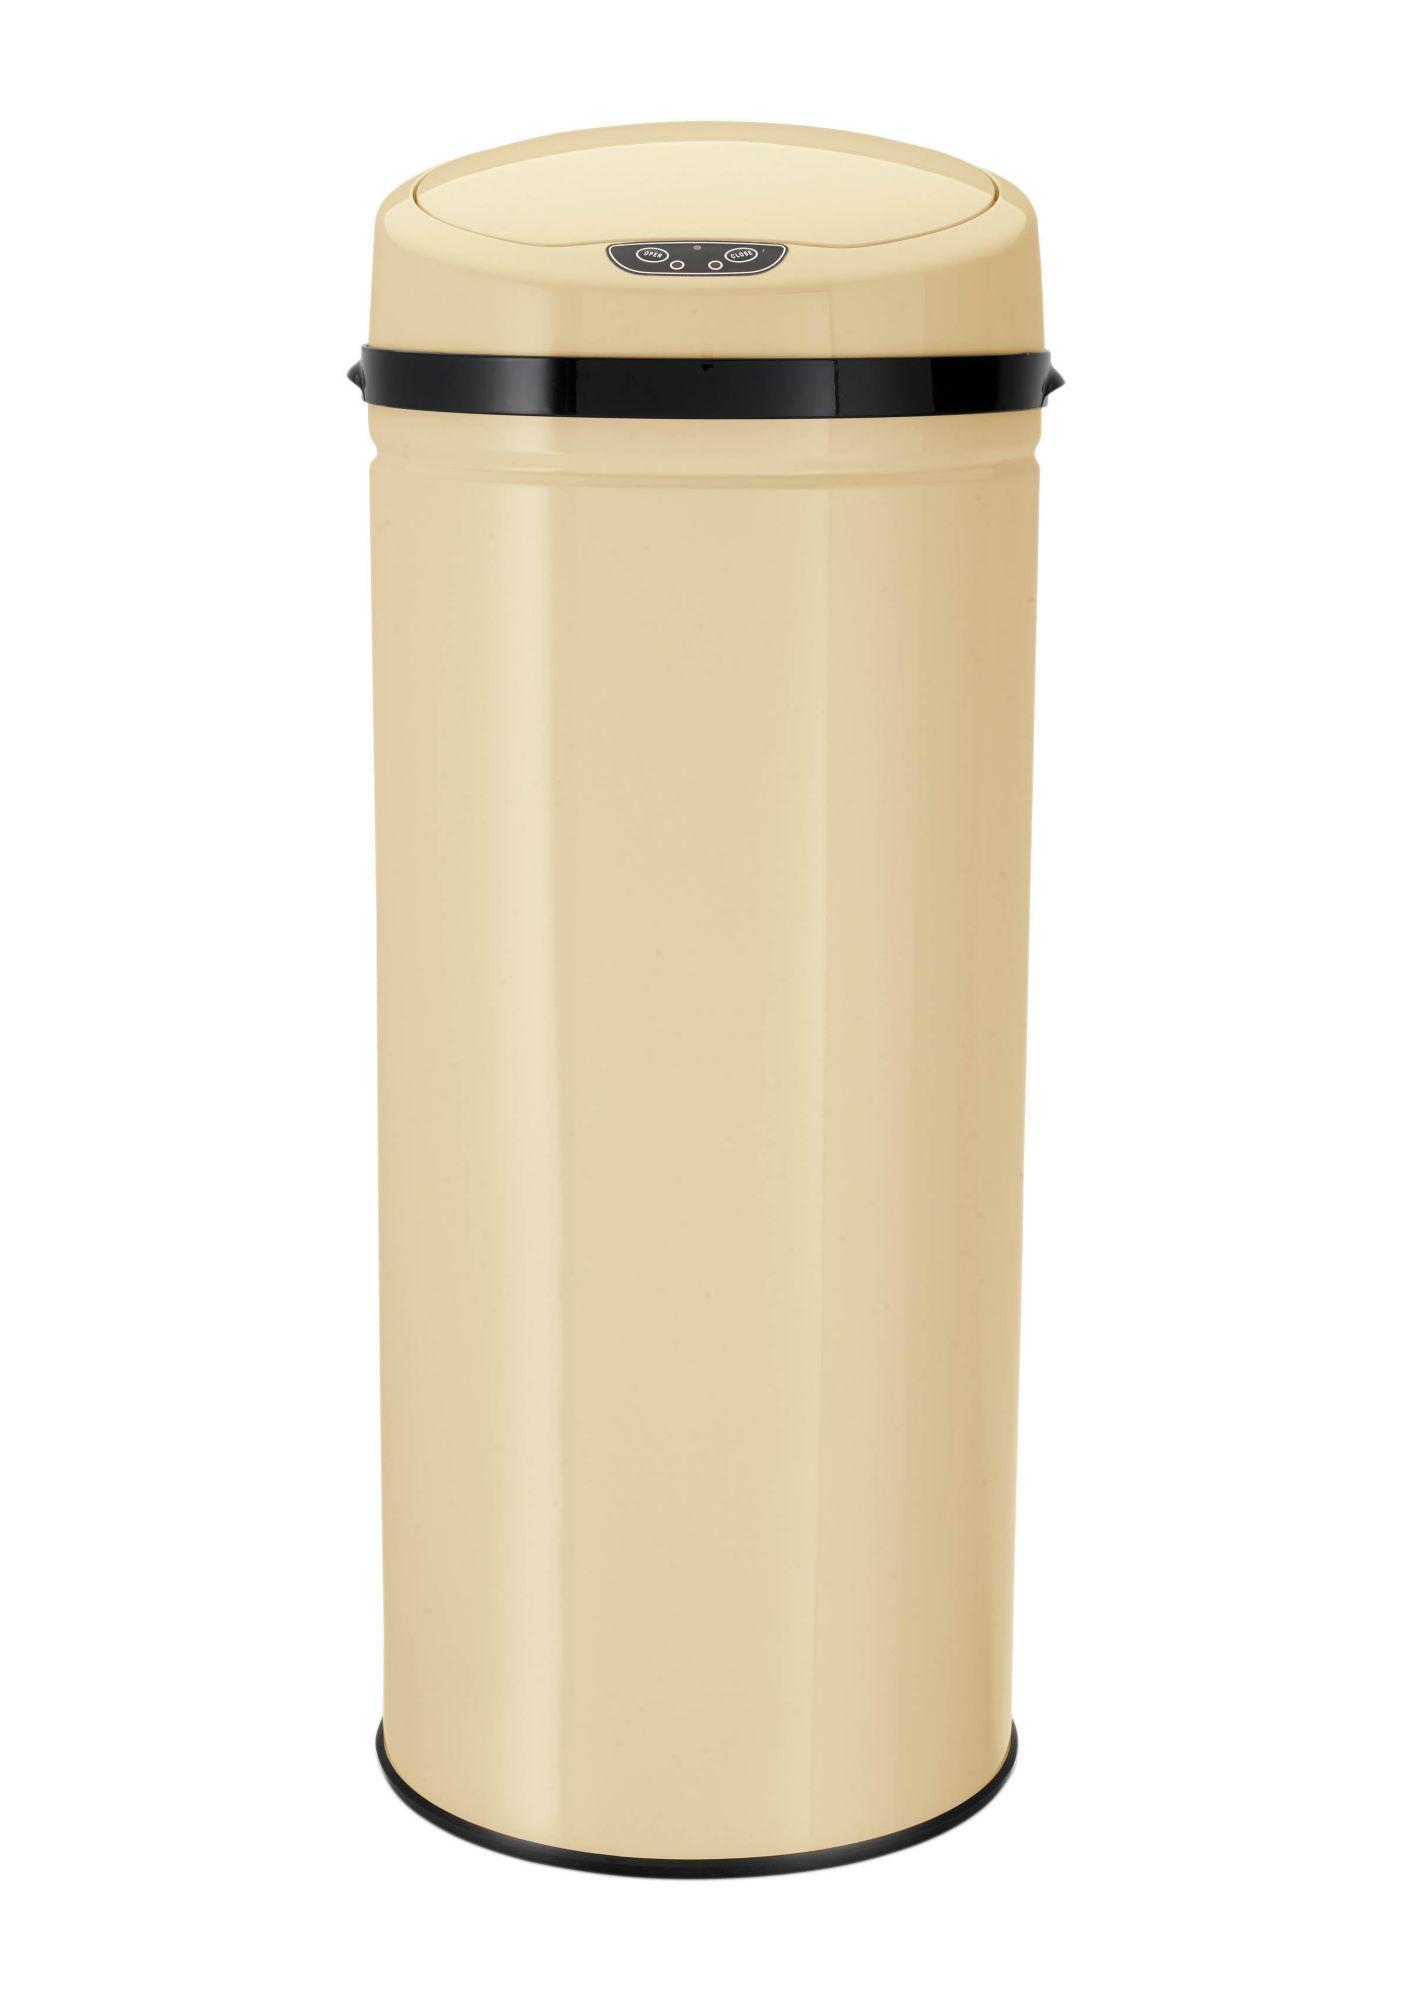 ECHTWERK Edelstahl-Abfalleimer mit Infrarotsensor, 42 Liter, »INOX VANILLA«, Echtwerk